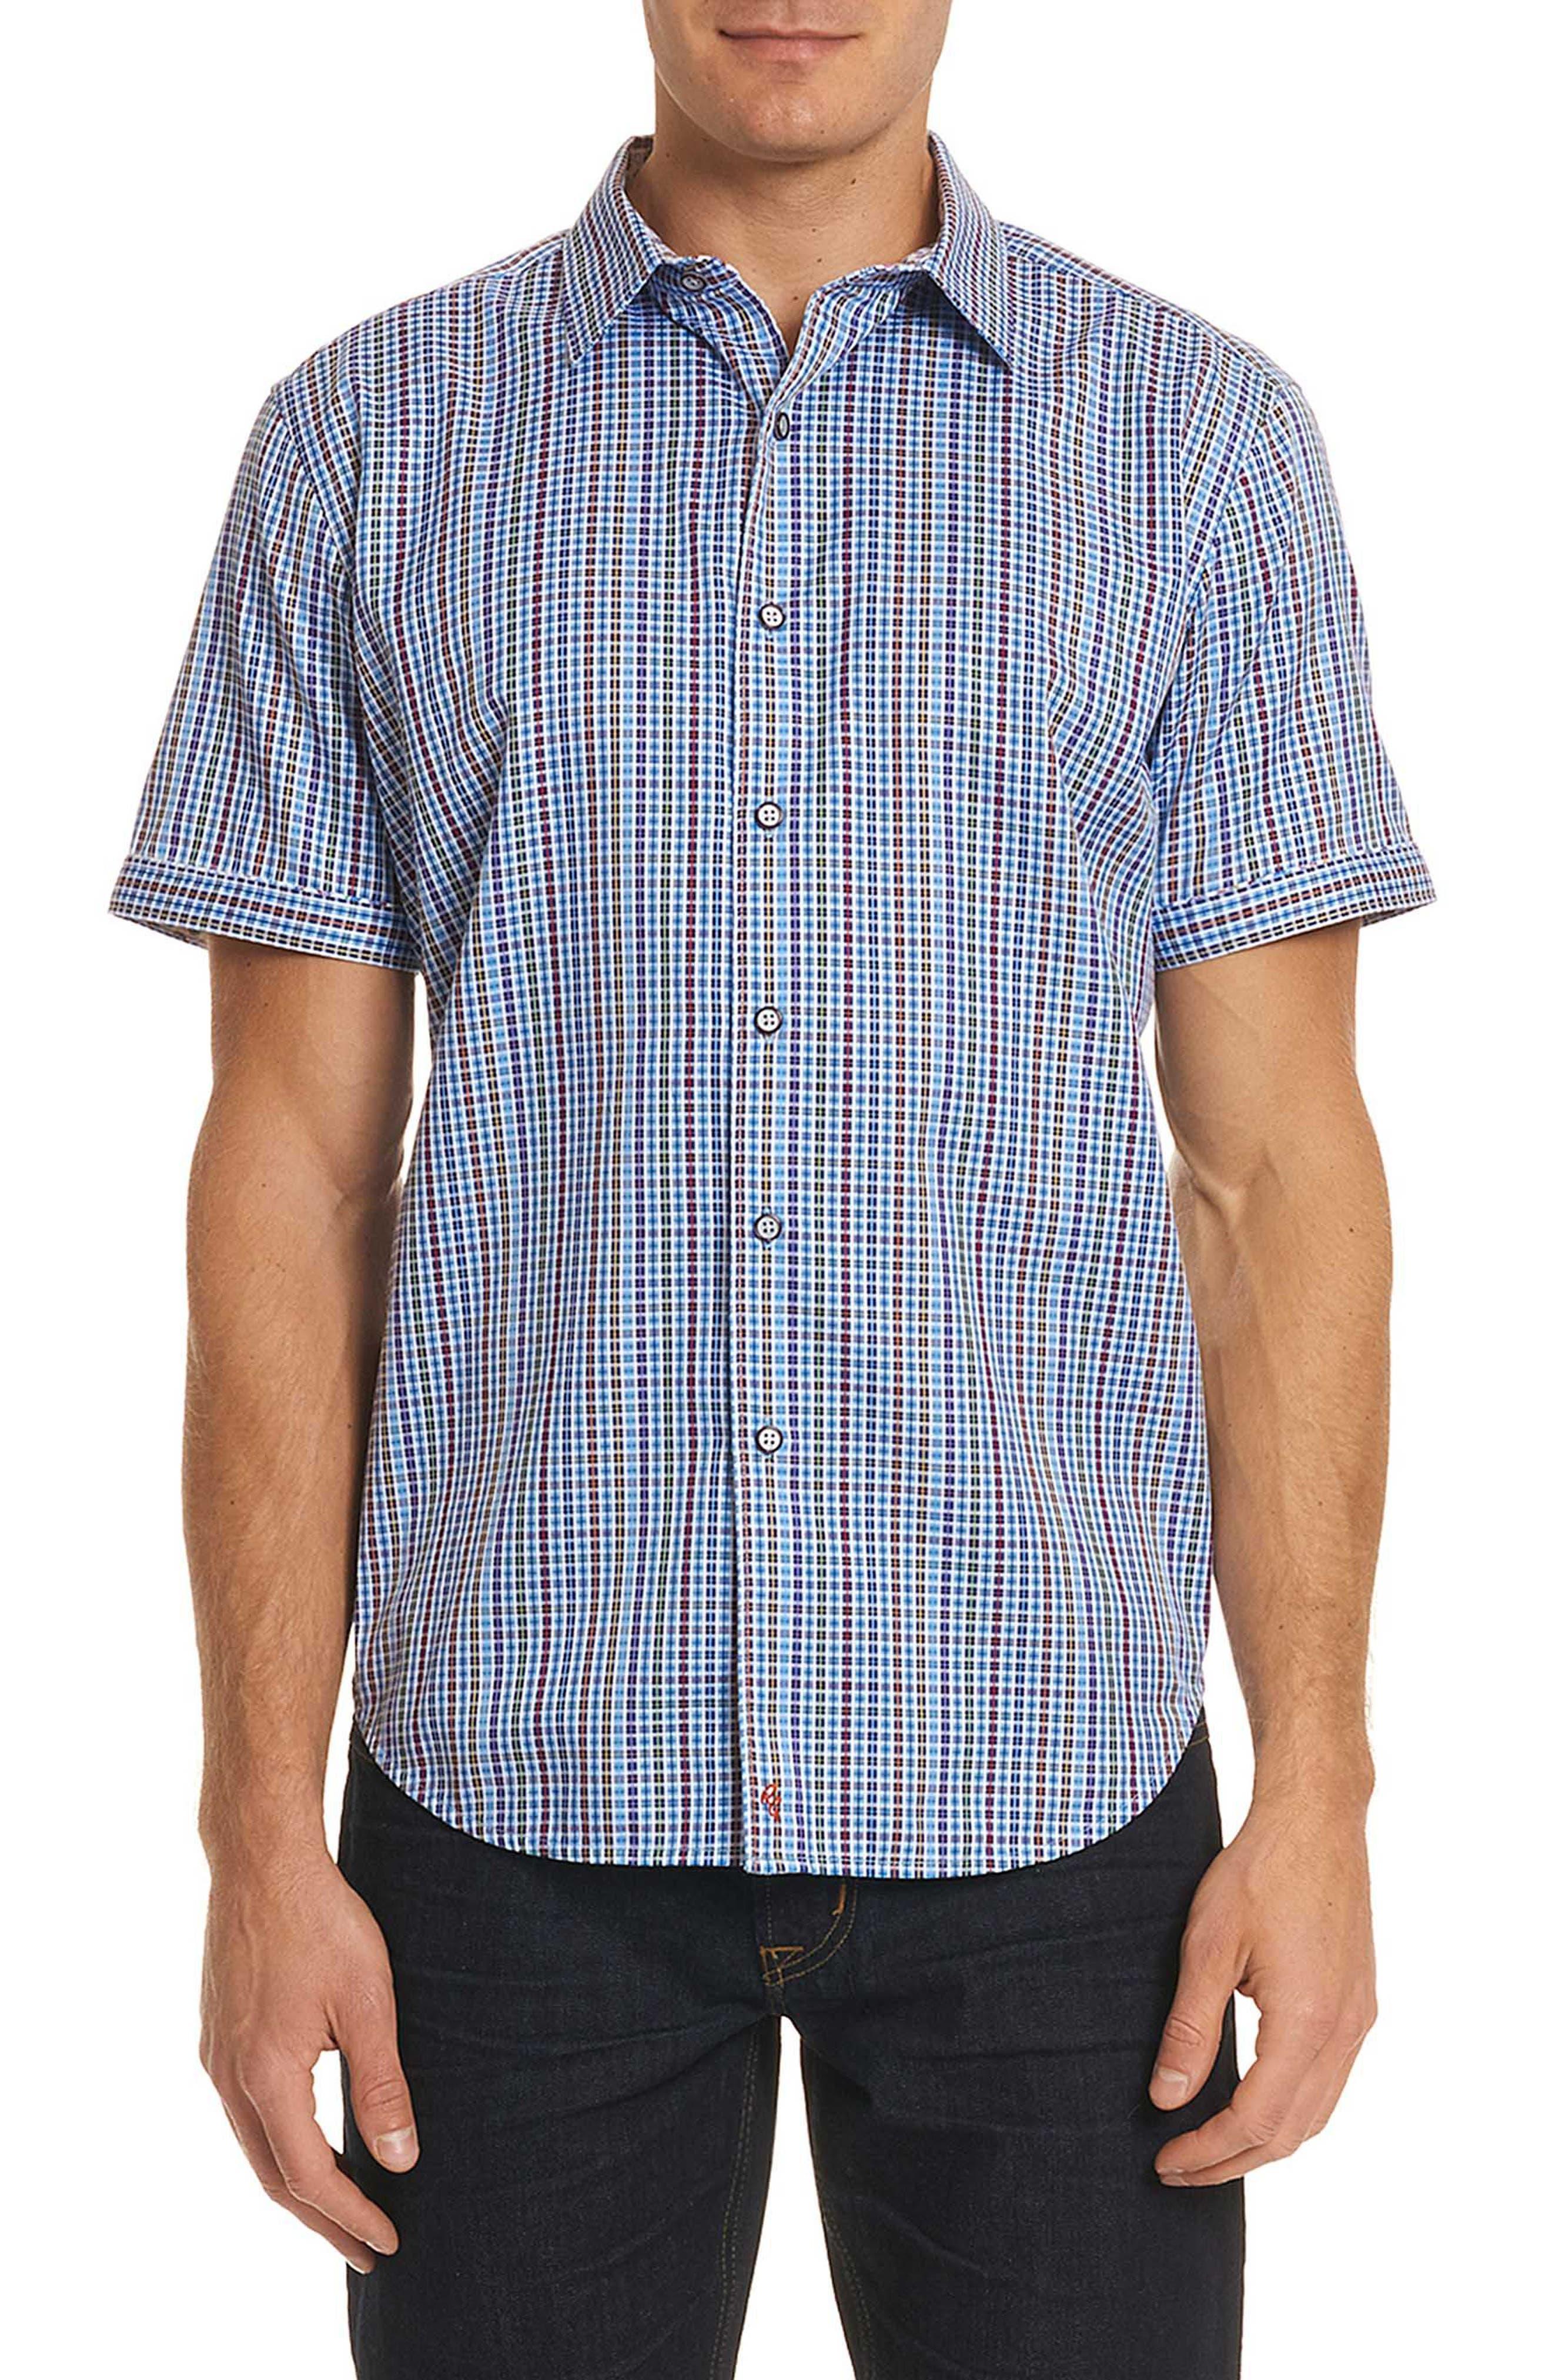 Palma Classic Fit Plaid Sport Shirt,                             Main thumbnail 1, color,                             450